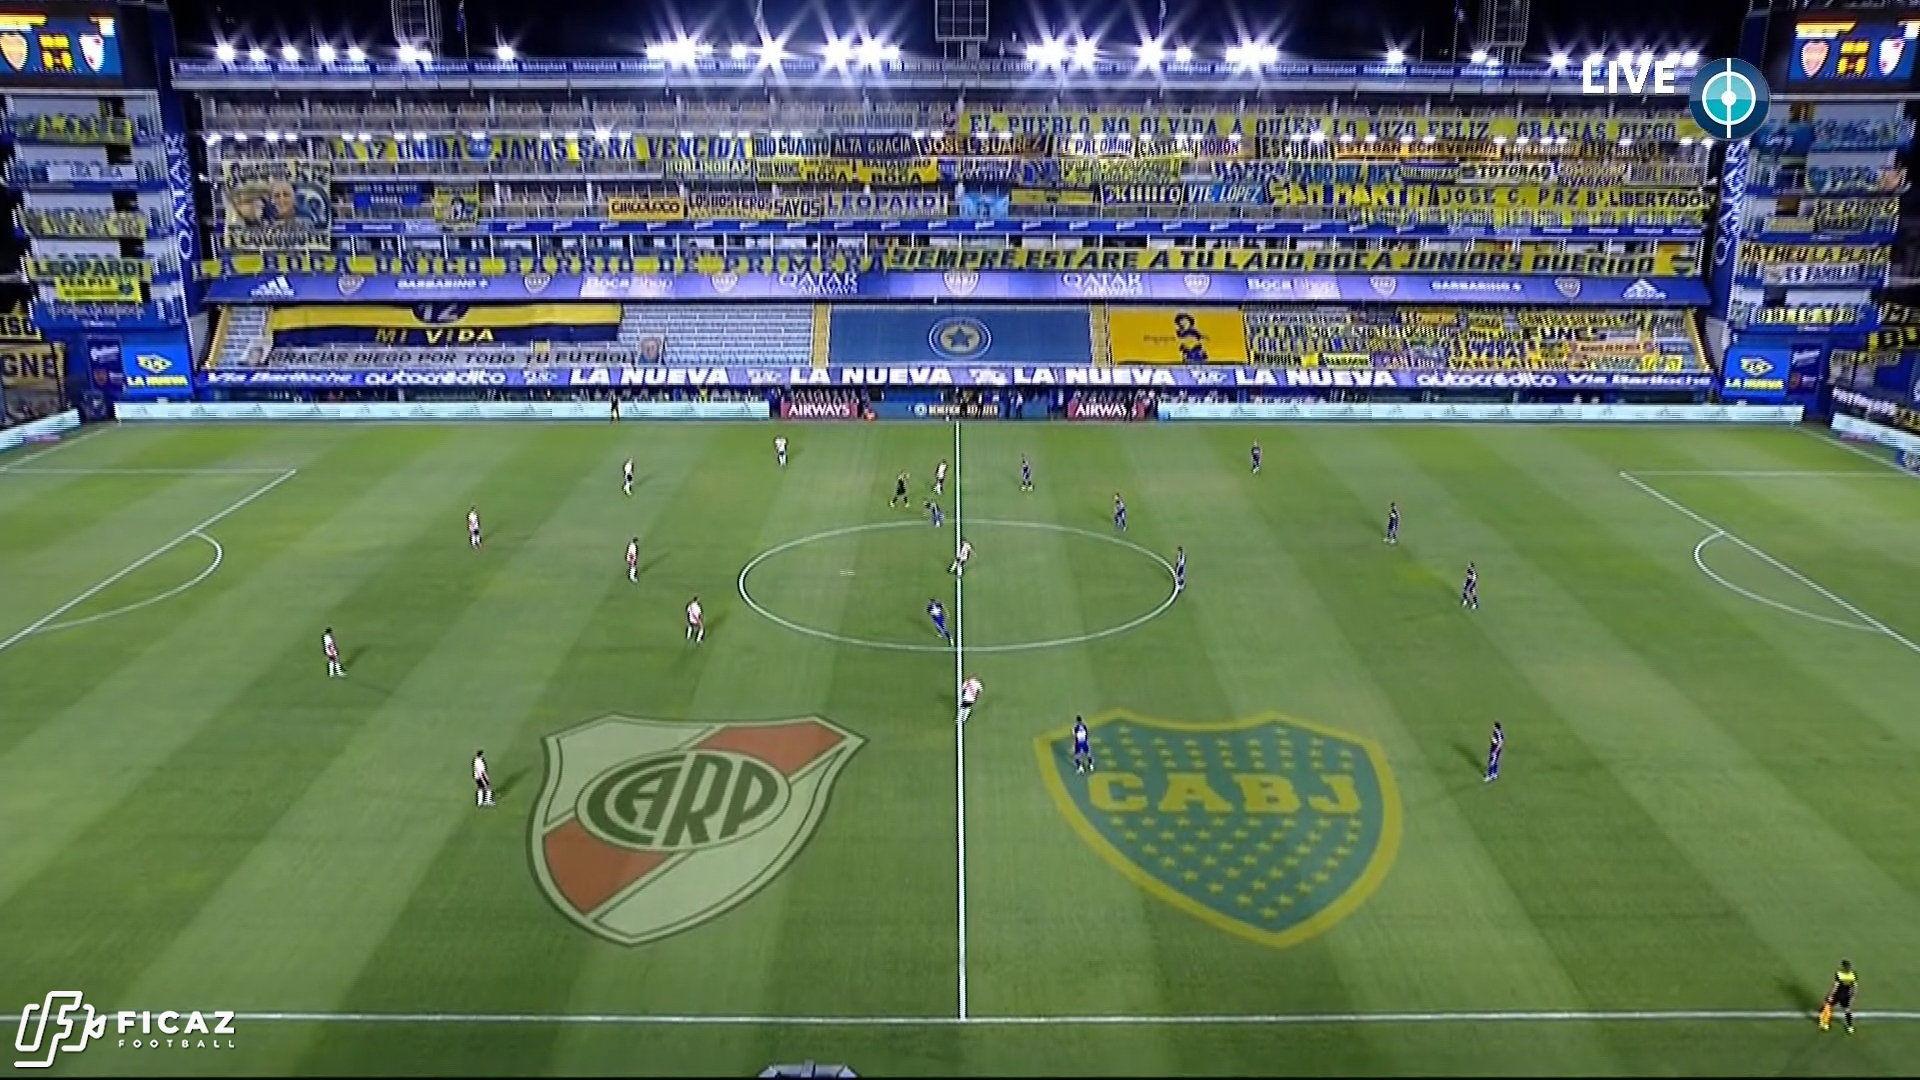 Boca Juniors - Main